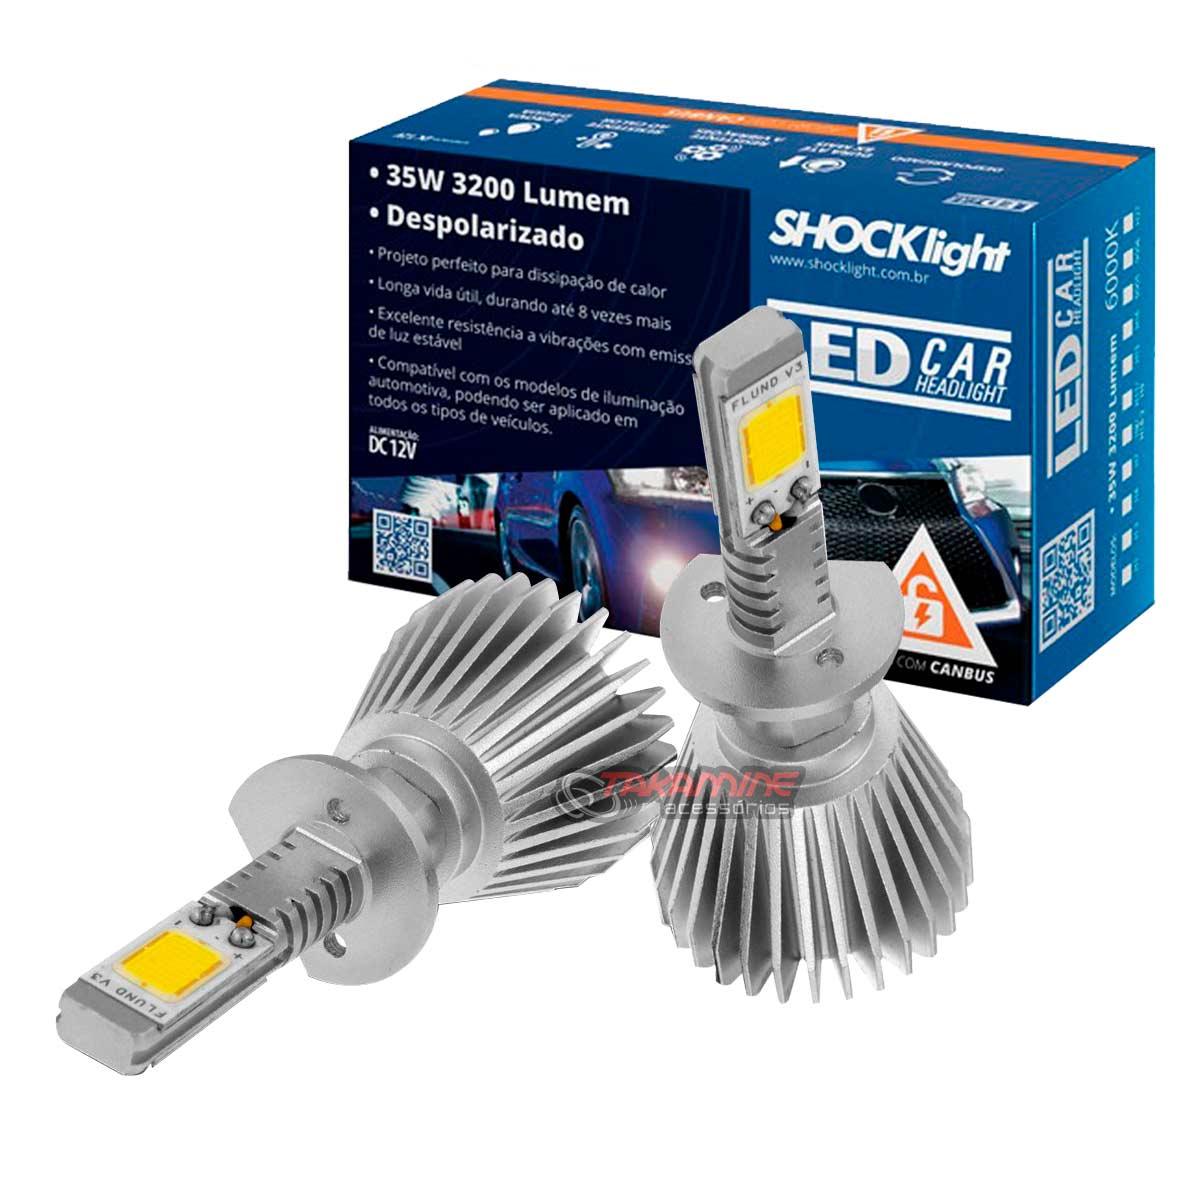 Kit LED 2D Headlight  tipo xenon modelo H1 35W